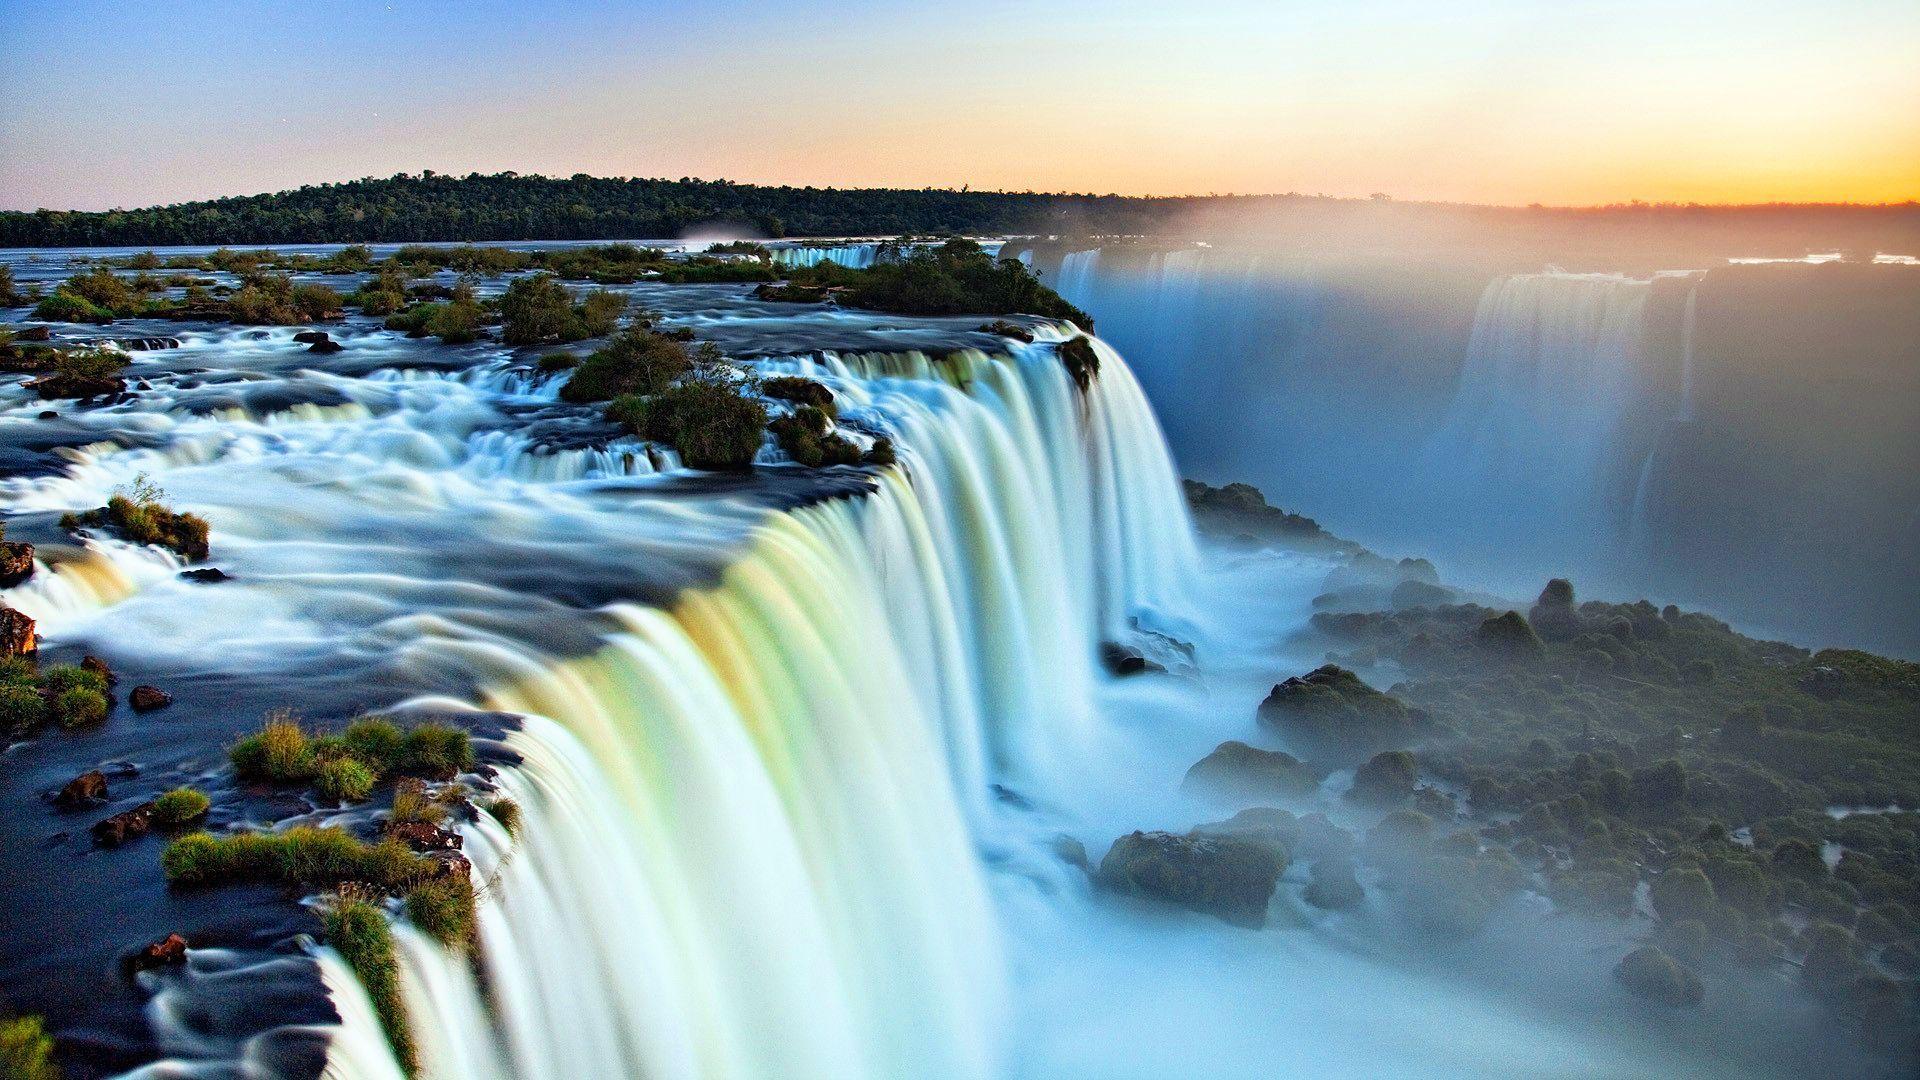 Niagara Falls Hd Wallpapers Wallpaper Cave